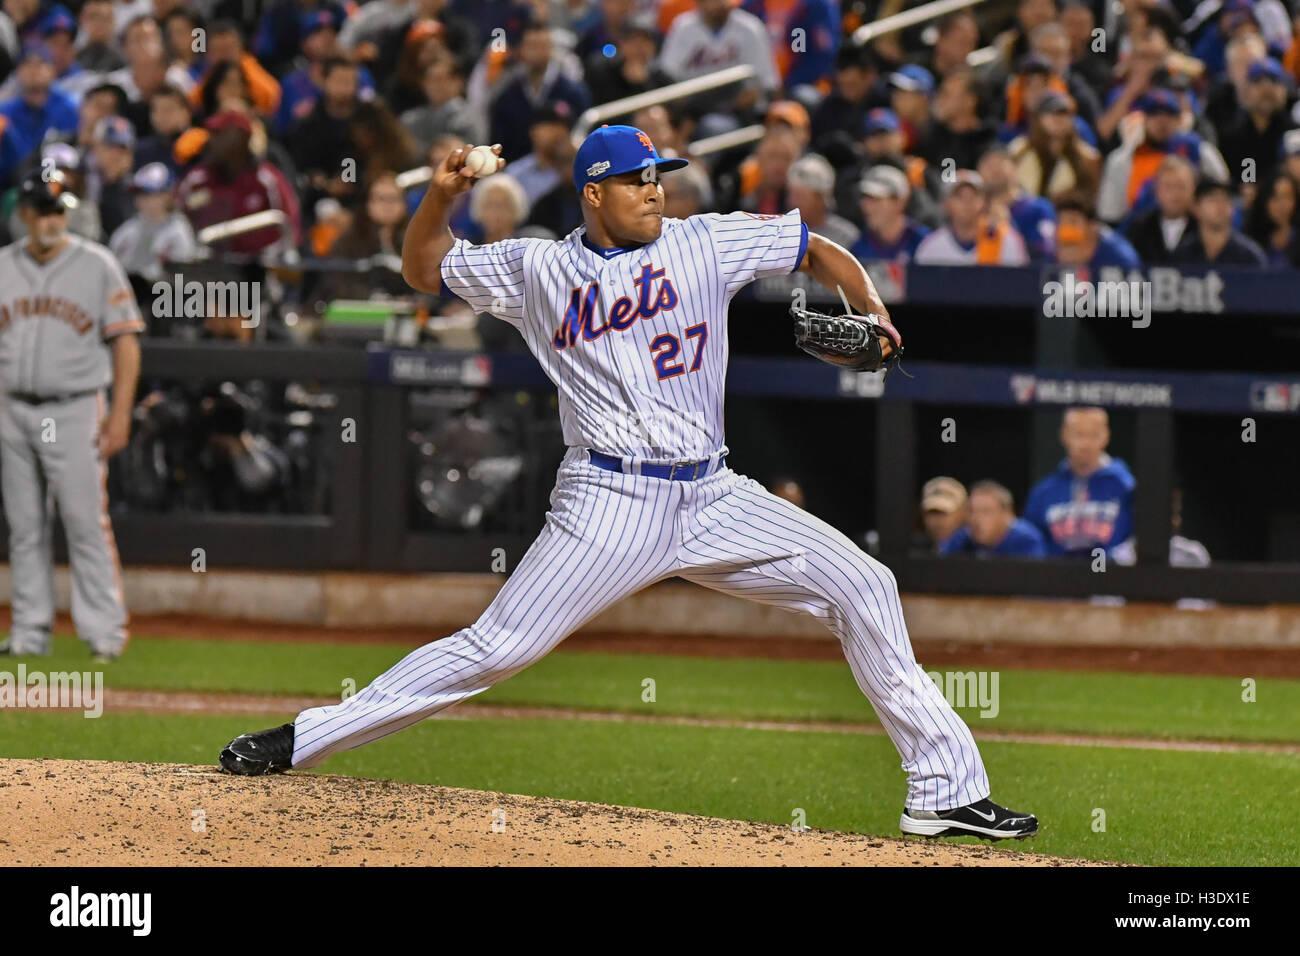 Flushing, New York, USA. 5ème Oct, 2016. Jeurys Familia (Mets) MLB: Jeurys Familia les Mets de New York Photo Stock